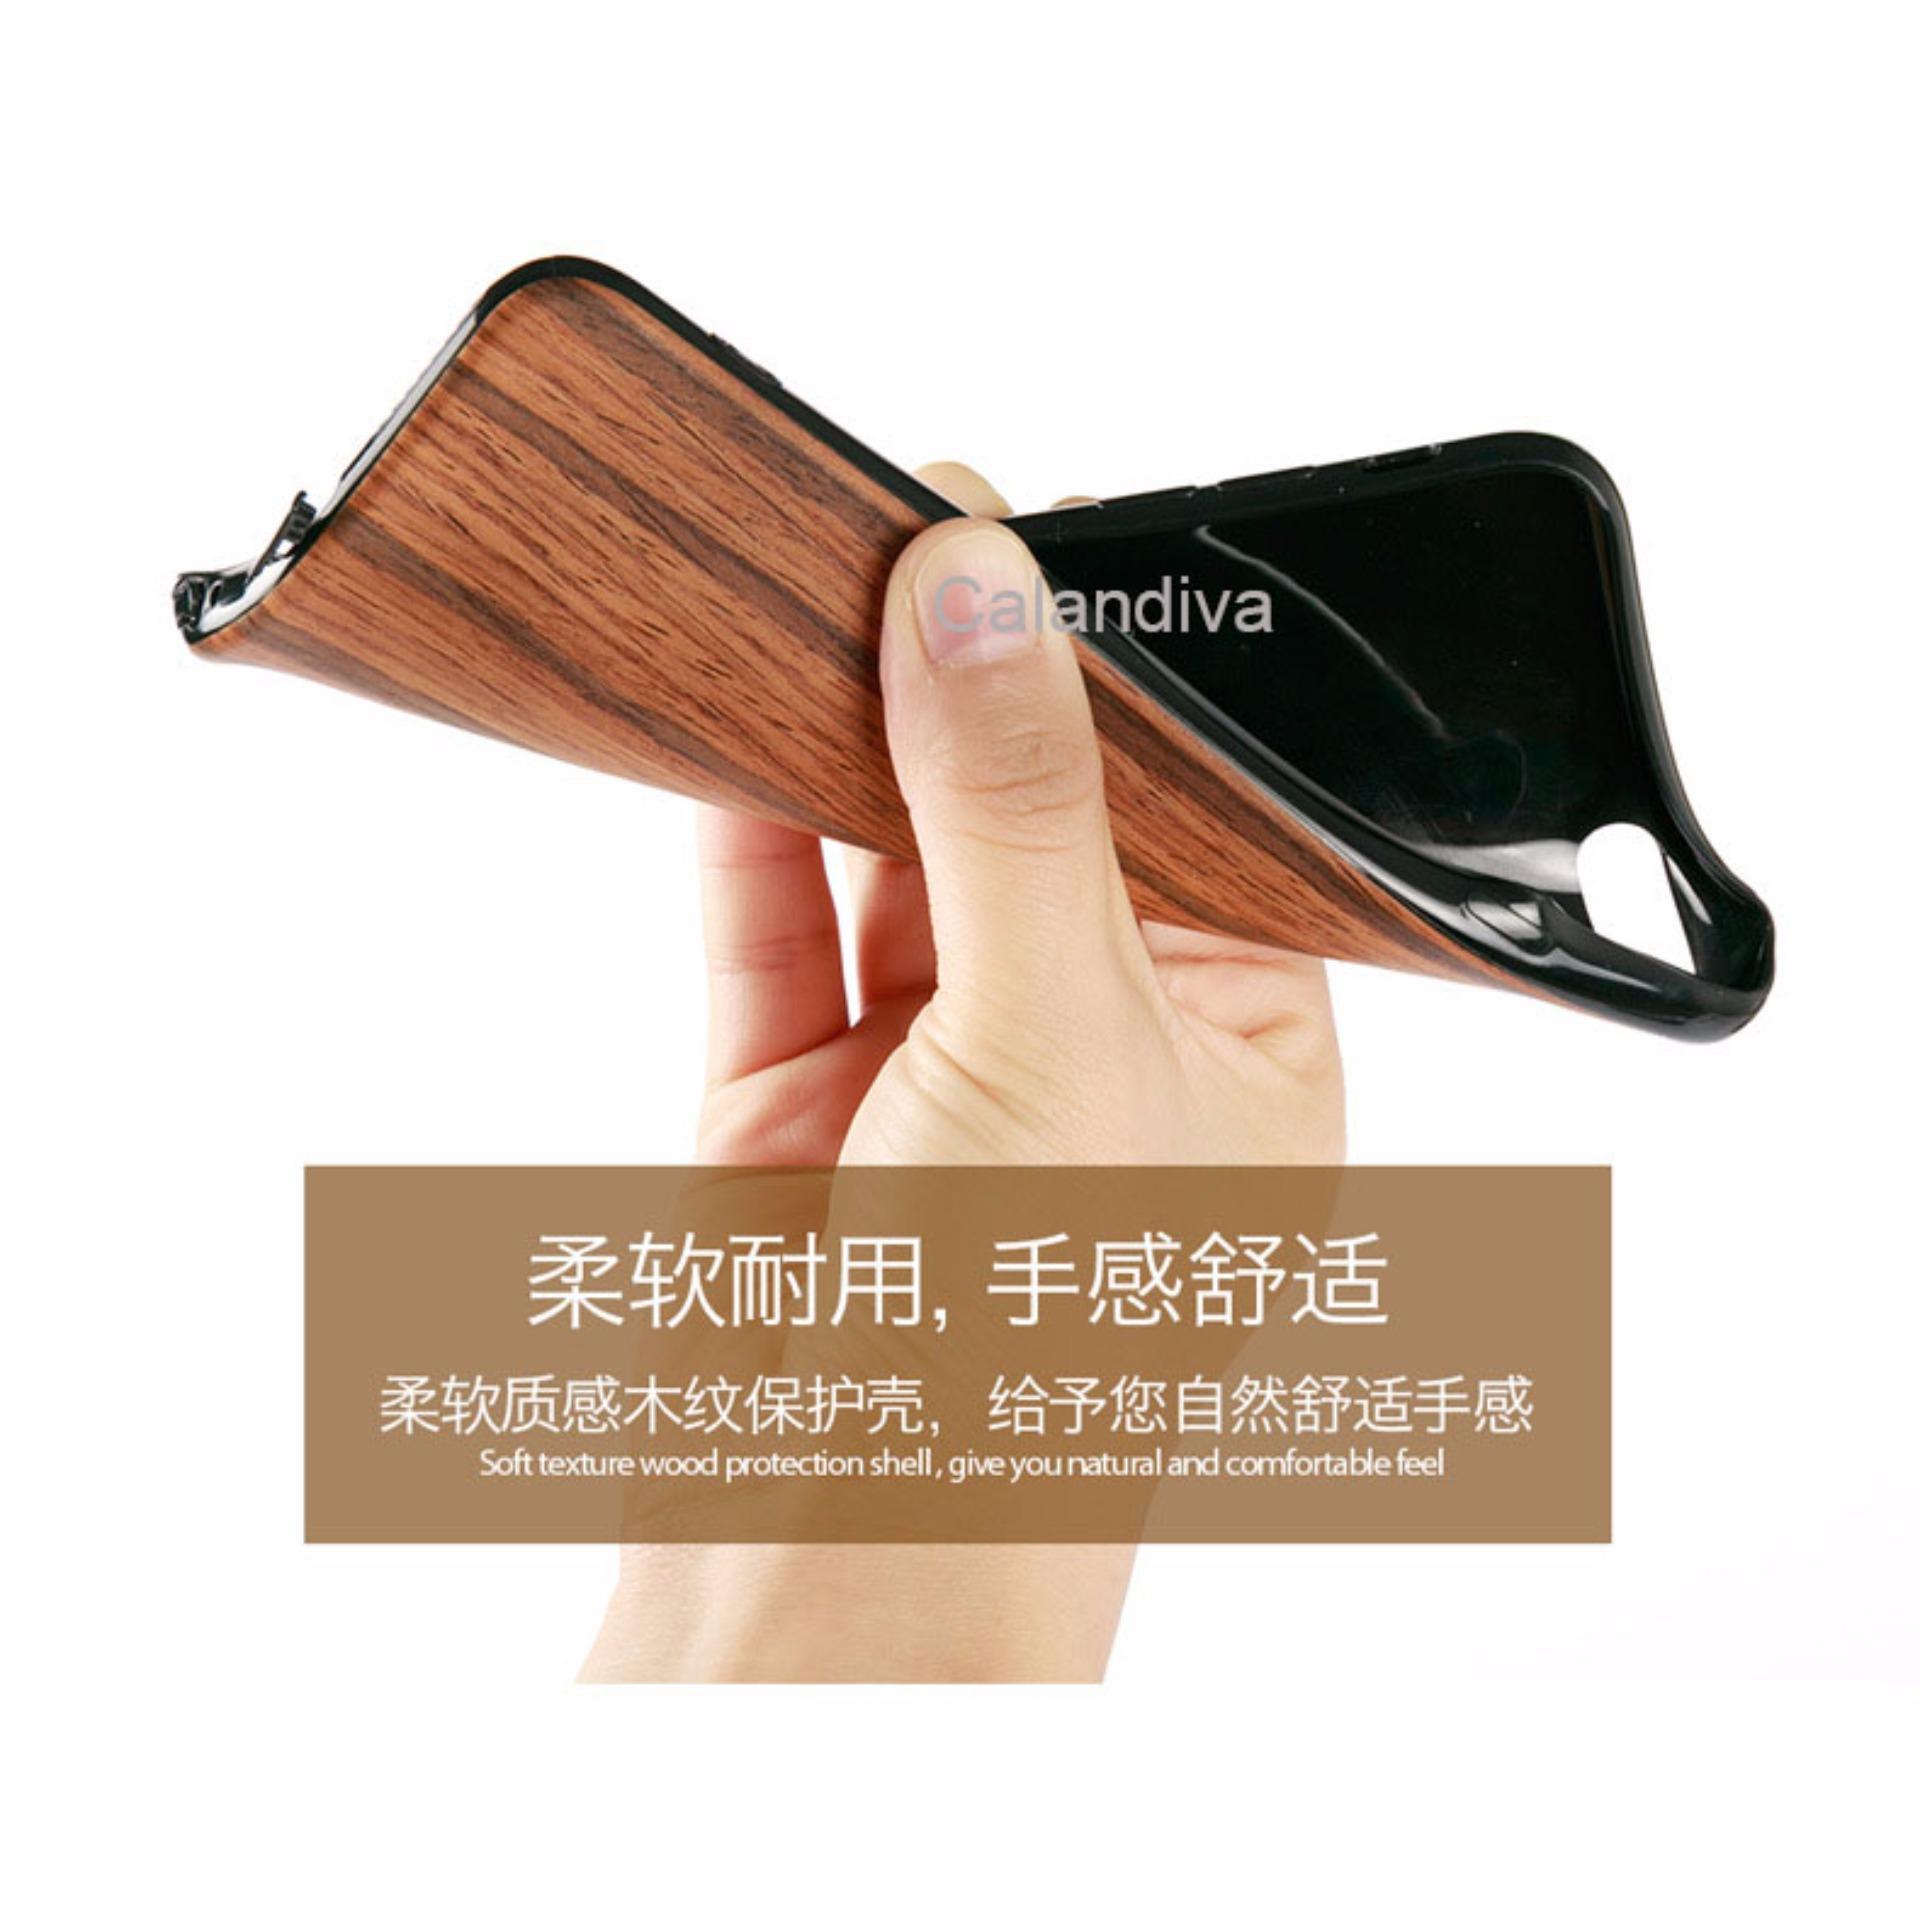 Calandiva Wood Texture Slim Softcase for Xiaomi Redmi Note 3 / Prime / Pro Versi Kenzo ...